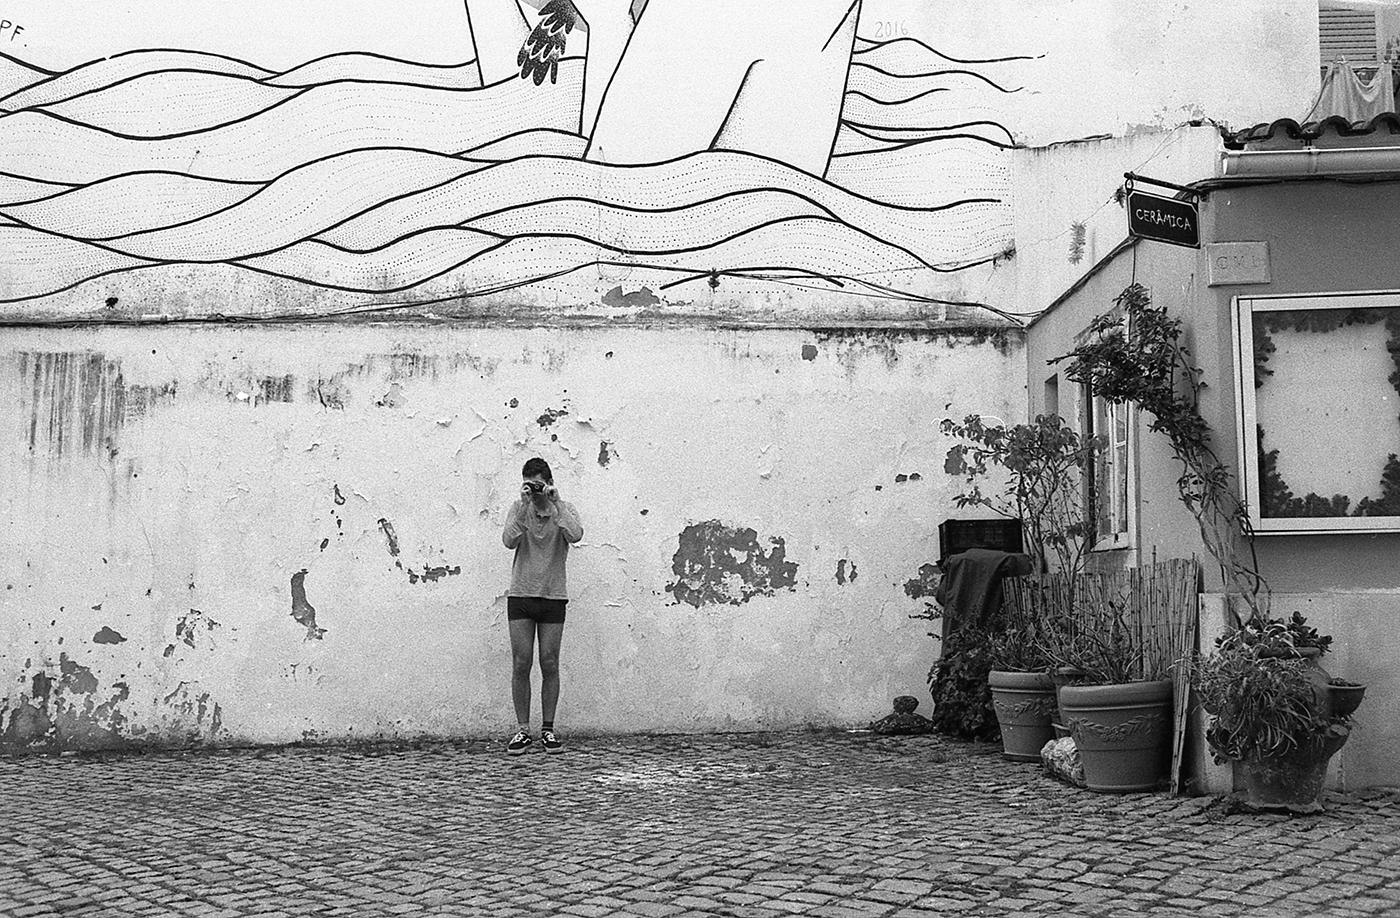 fotim-na-film-bw-portugal-ilford-pan-400